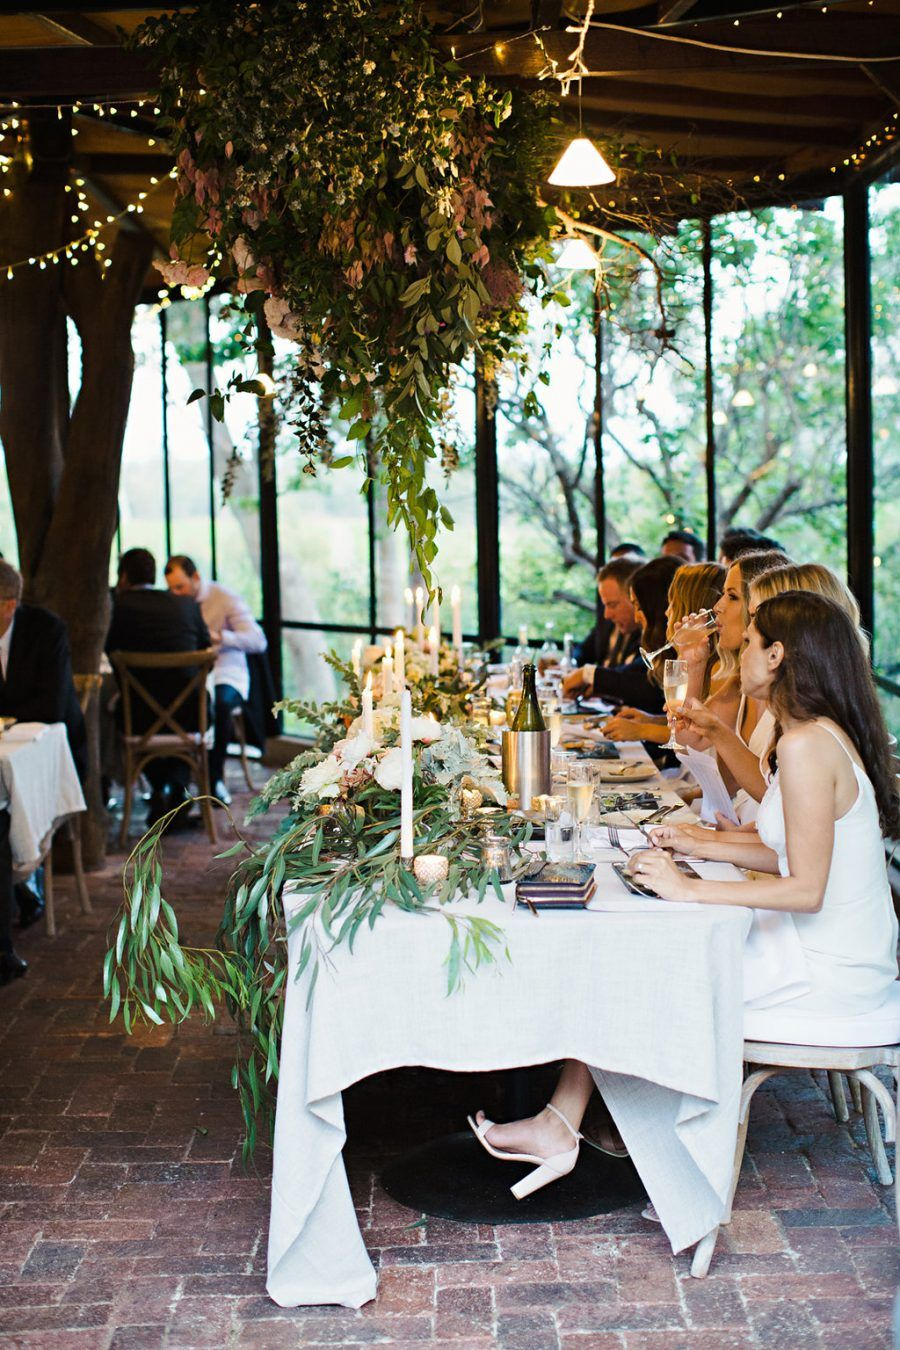 best outdoor wedding venues perth%0A Millbrook Winery  Jarrahdale   Wedding Venues Perth   Find more Perth  wedding venues at www ourweddingdate com au   Dream Wedding   Pinterest    Millbrook